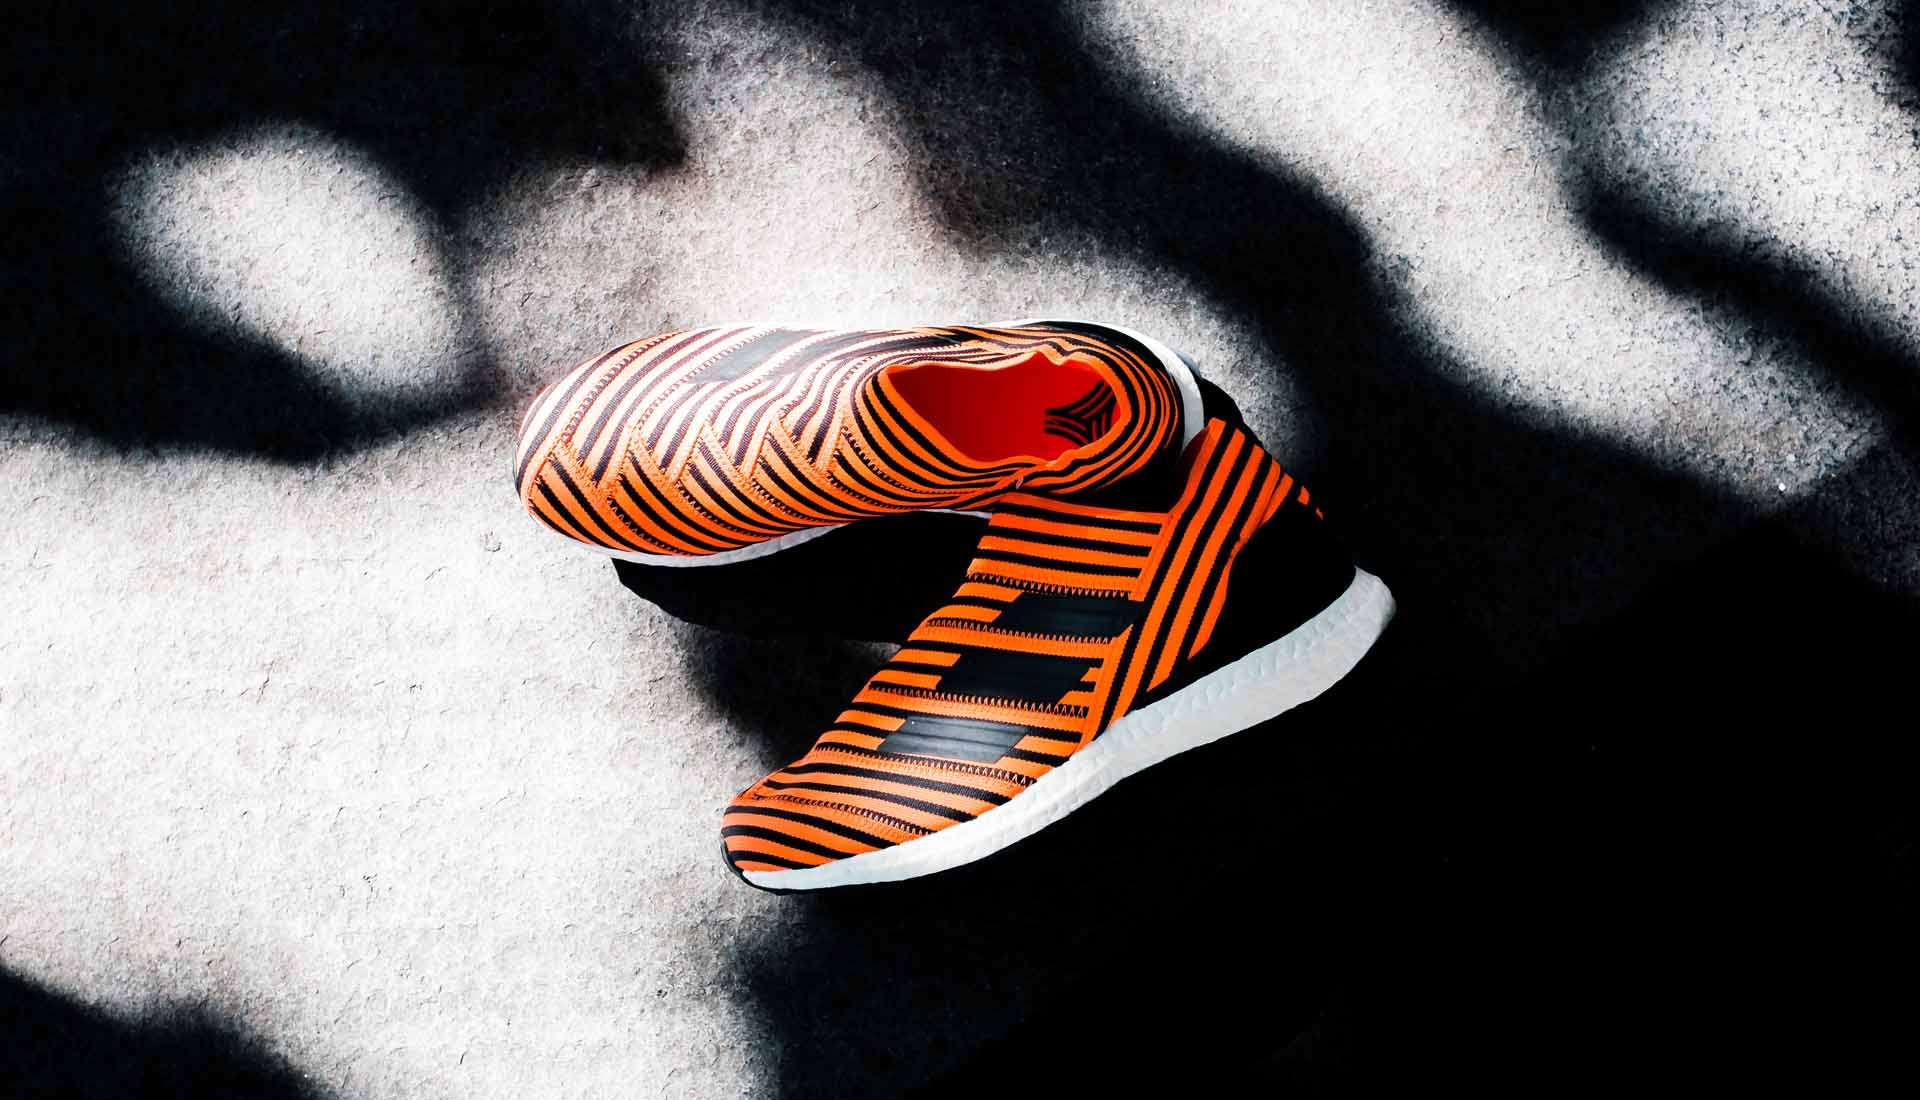 pyro-ultraboost-adidas-nemeziz-6-min.jpg